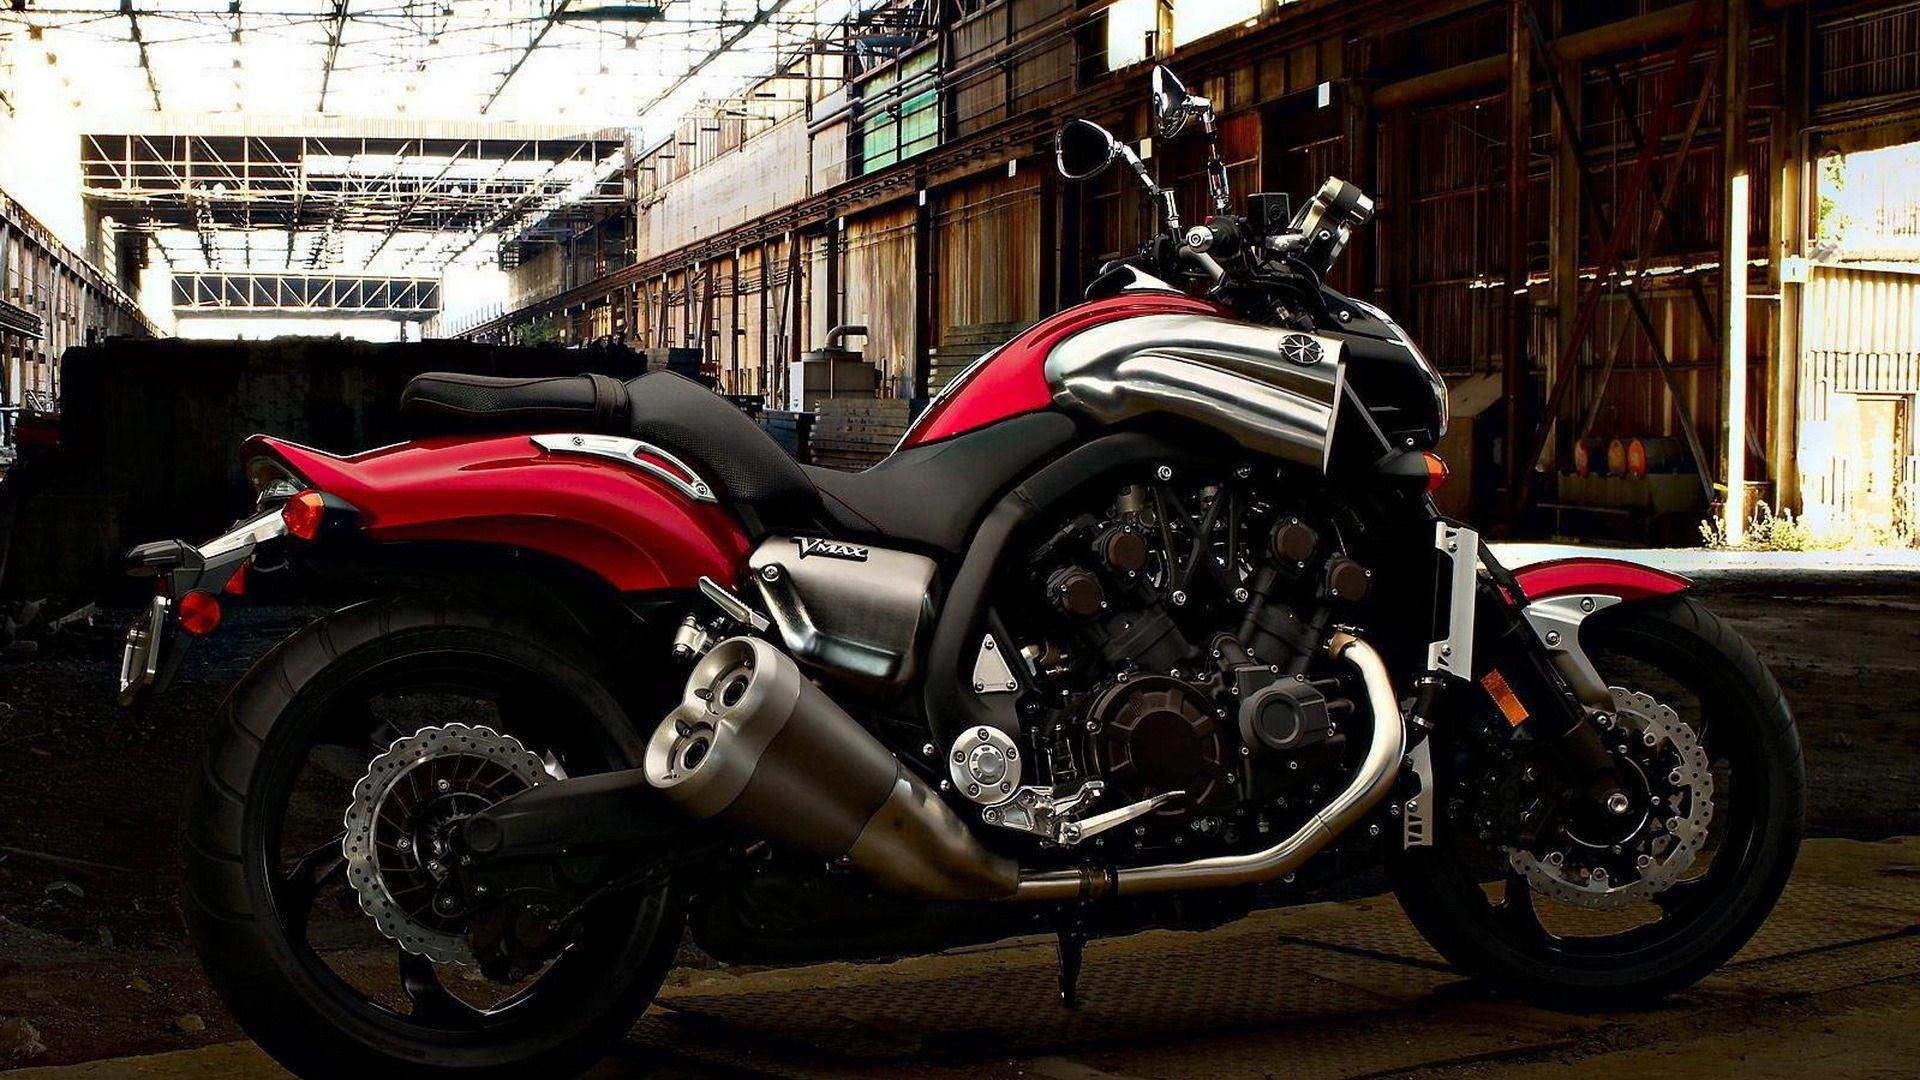 Hd wallpaper bike - Super Bikes Hd Wallpaper